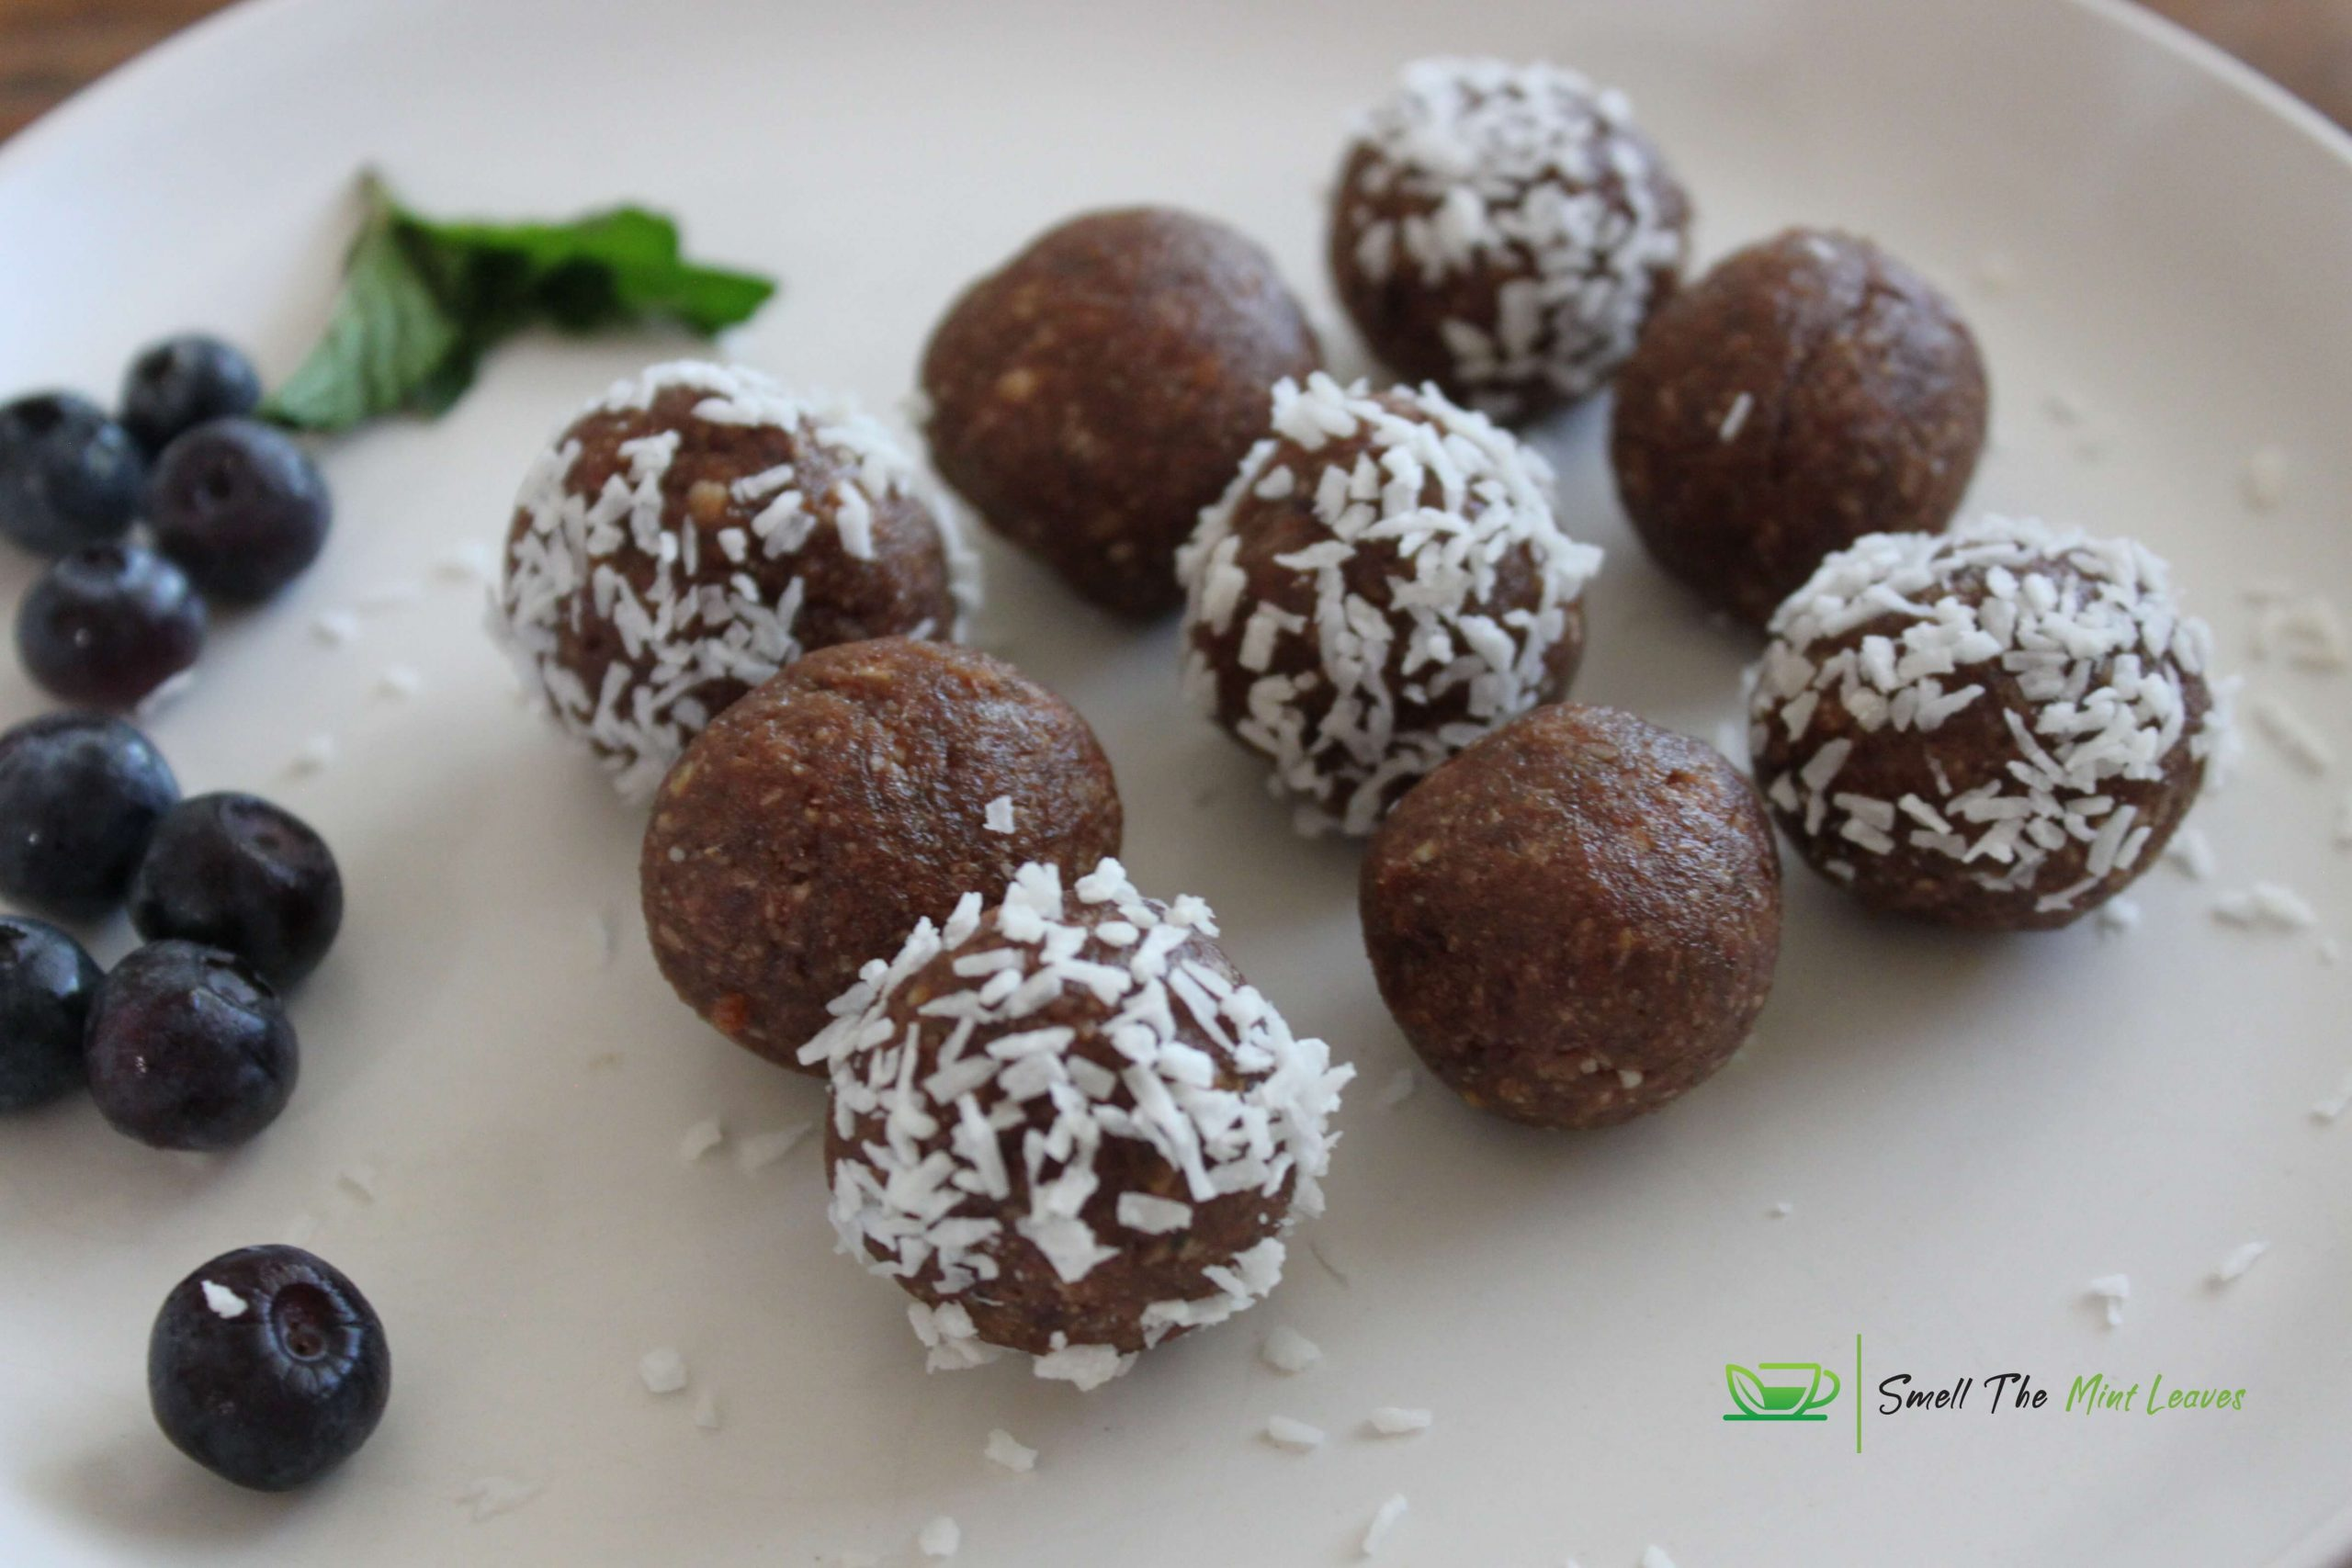 Peanut stuffed dates, lemon and coconut bites